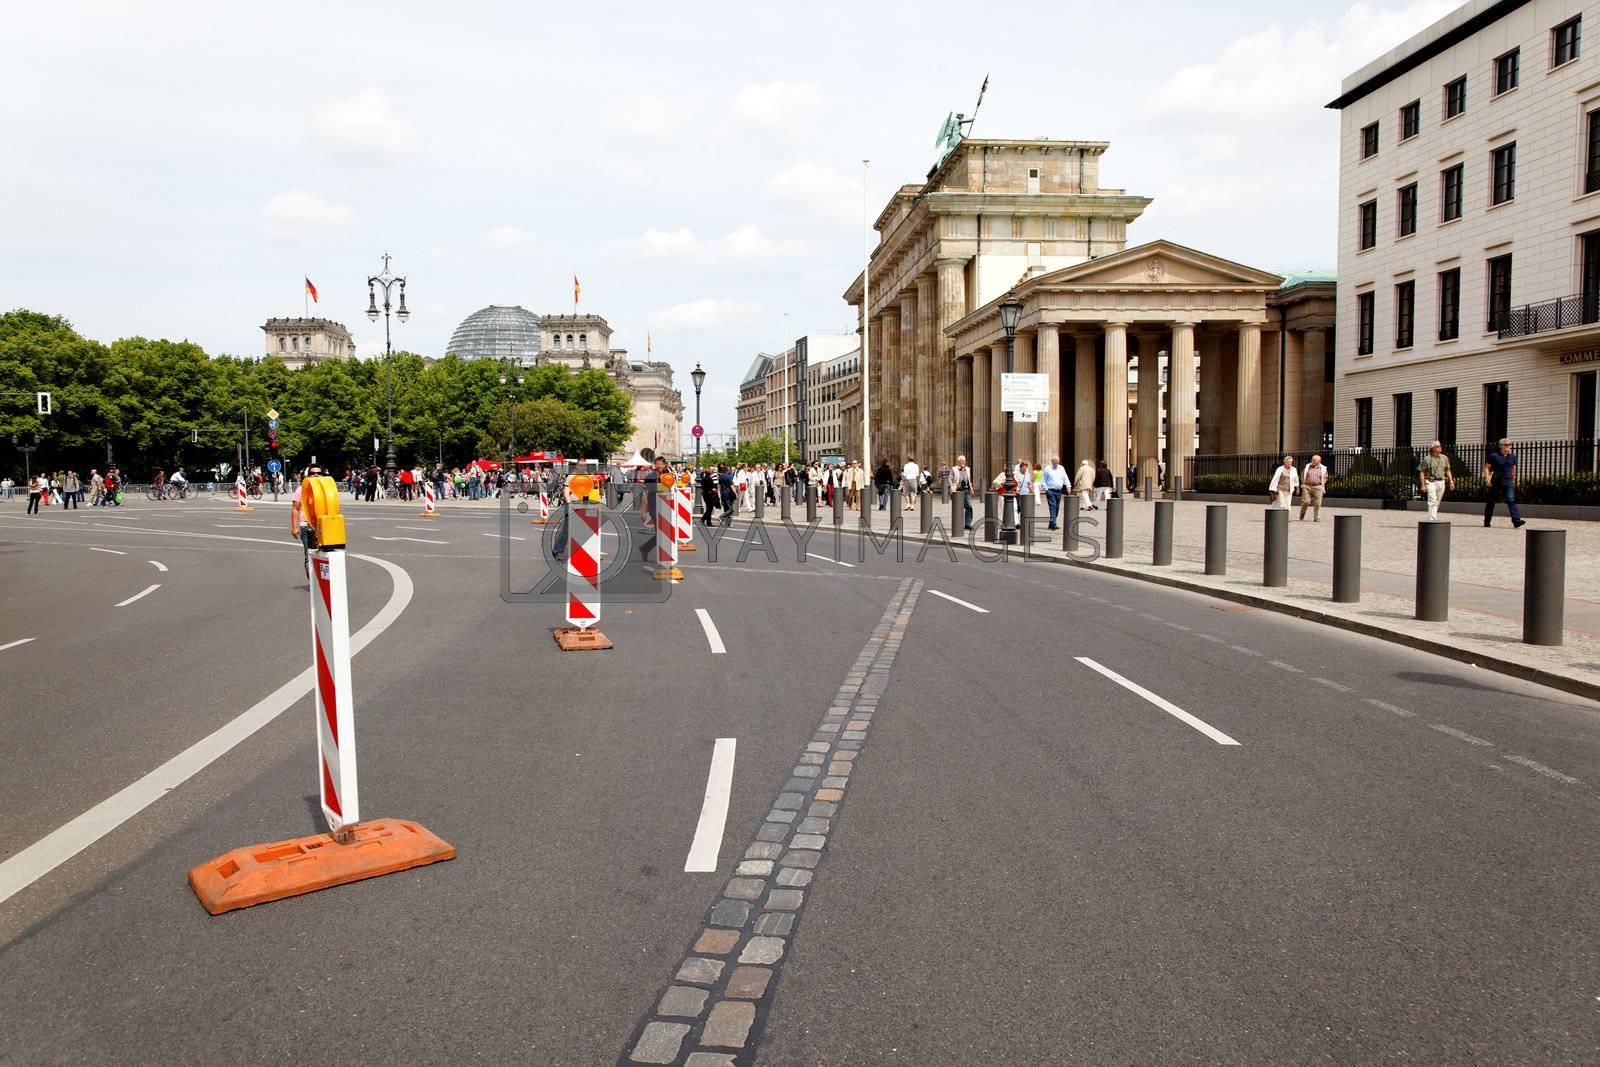 The Marks of Berlin wall near BRANDENBURG GATE